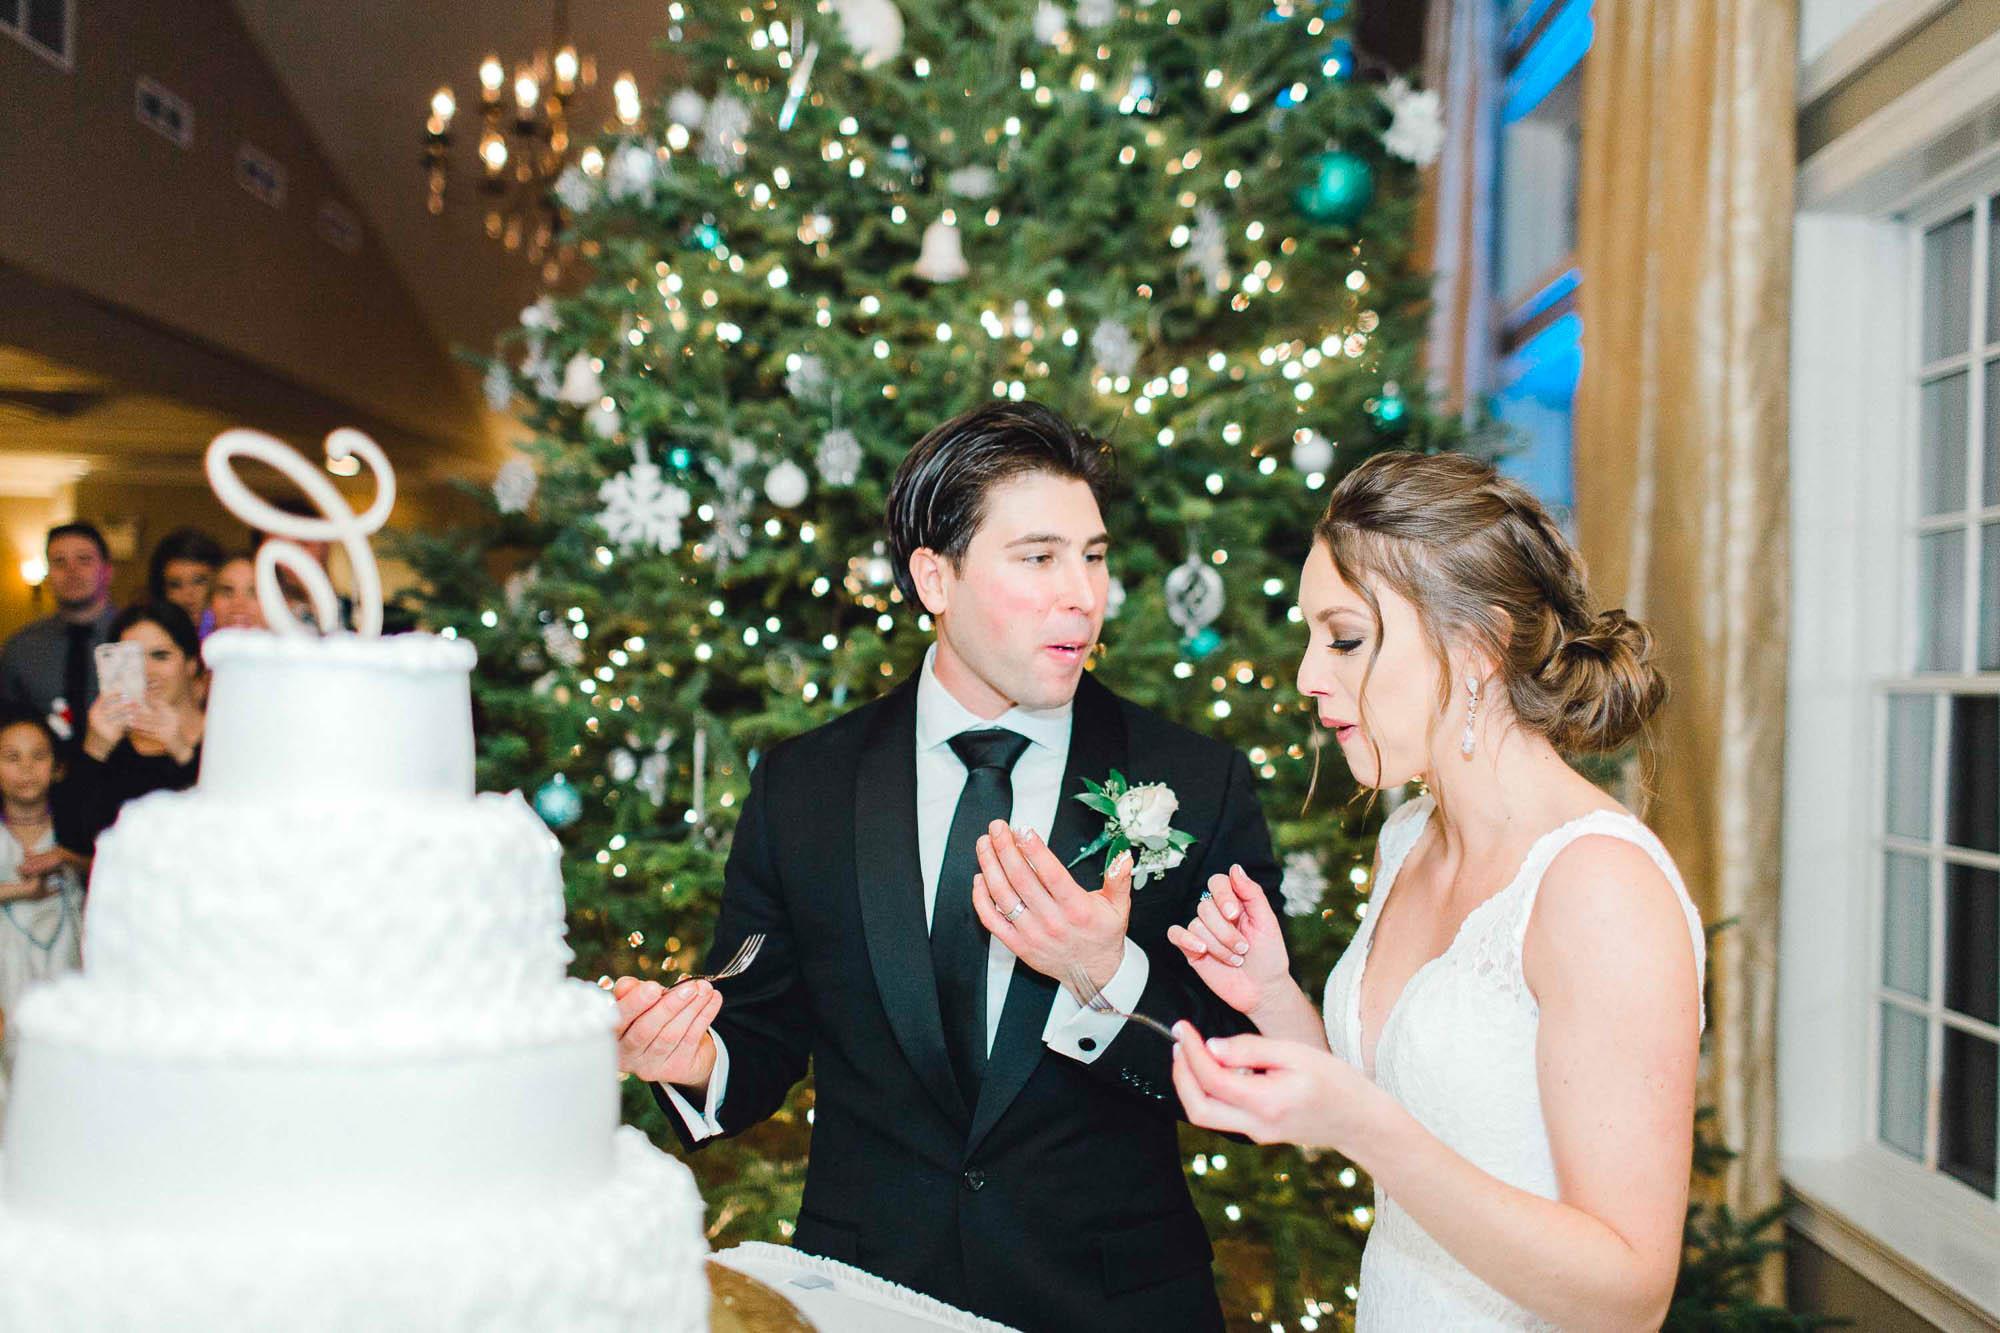 snowy-sand-springs-country-club-drums-pa-christmas-wedding-35154.jpg